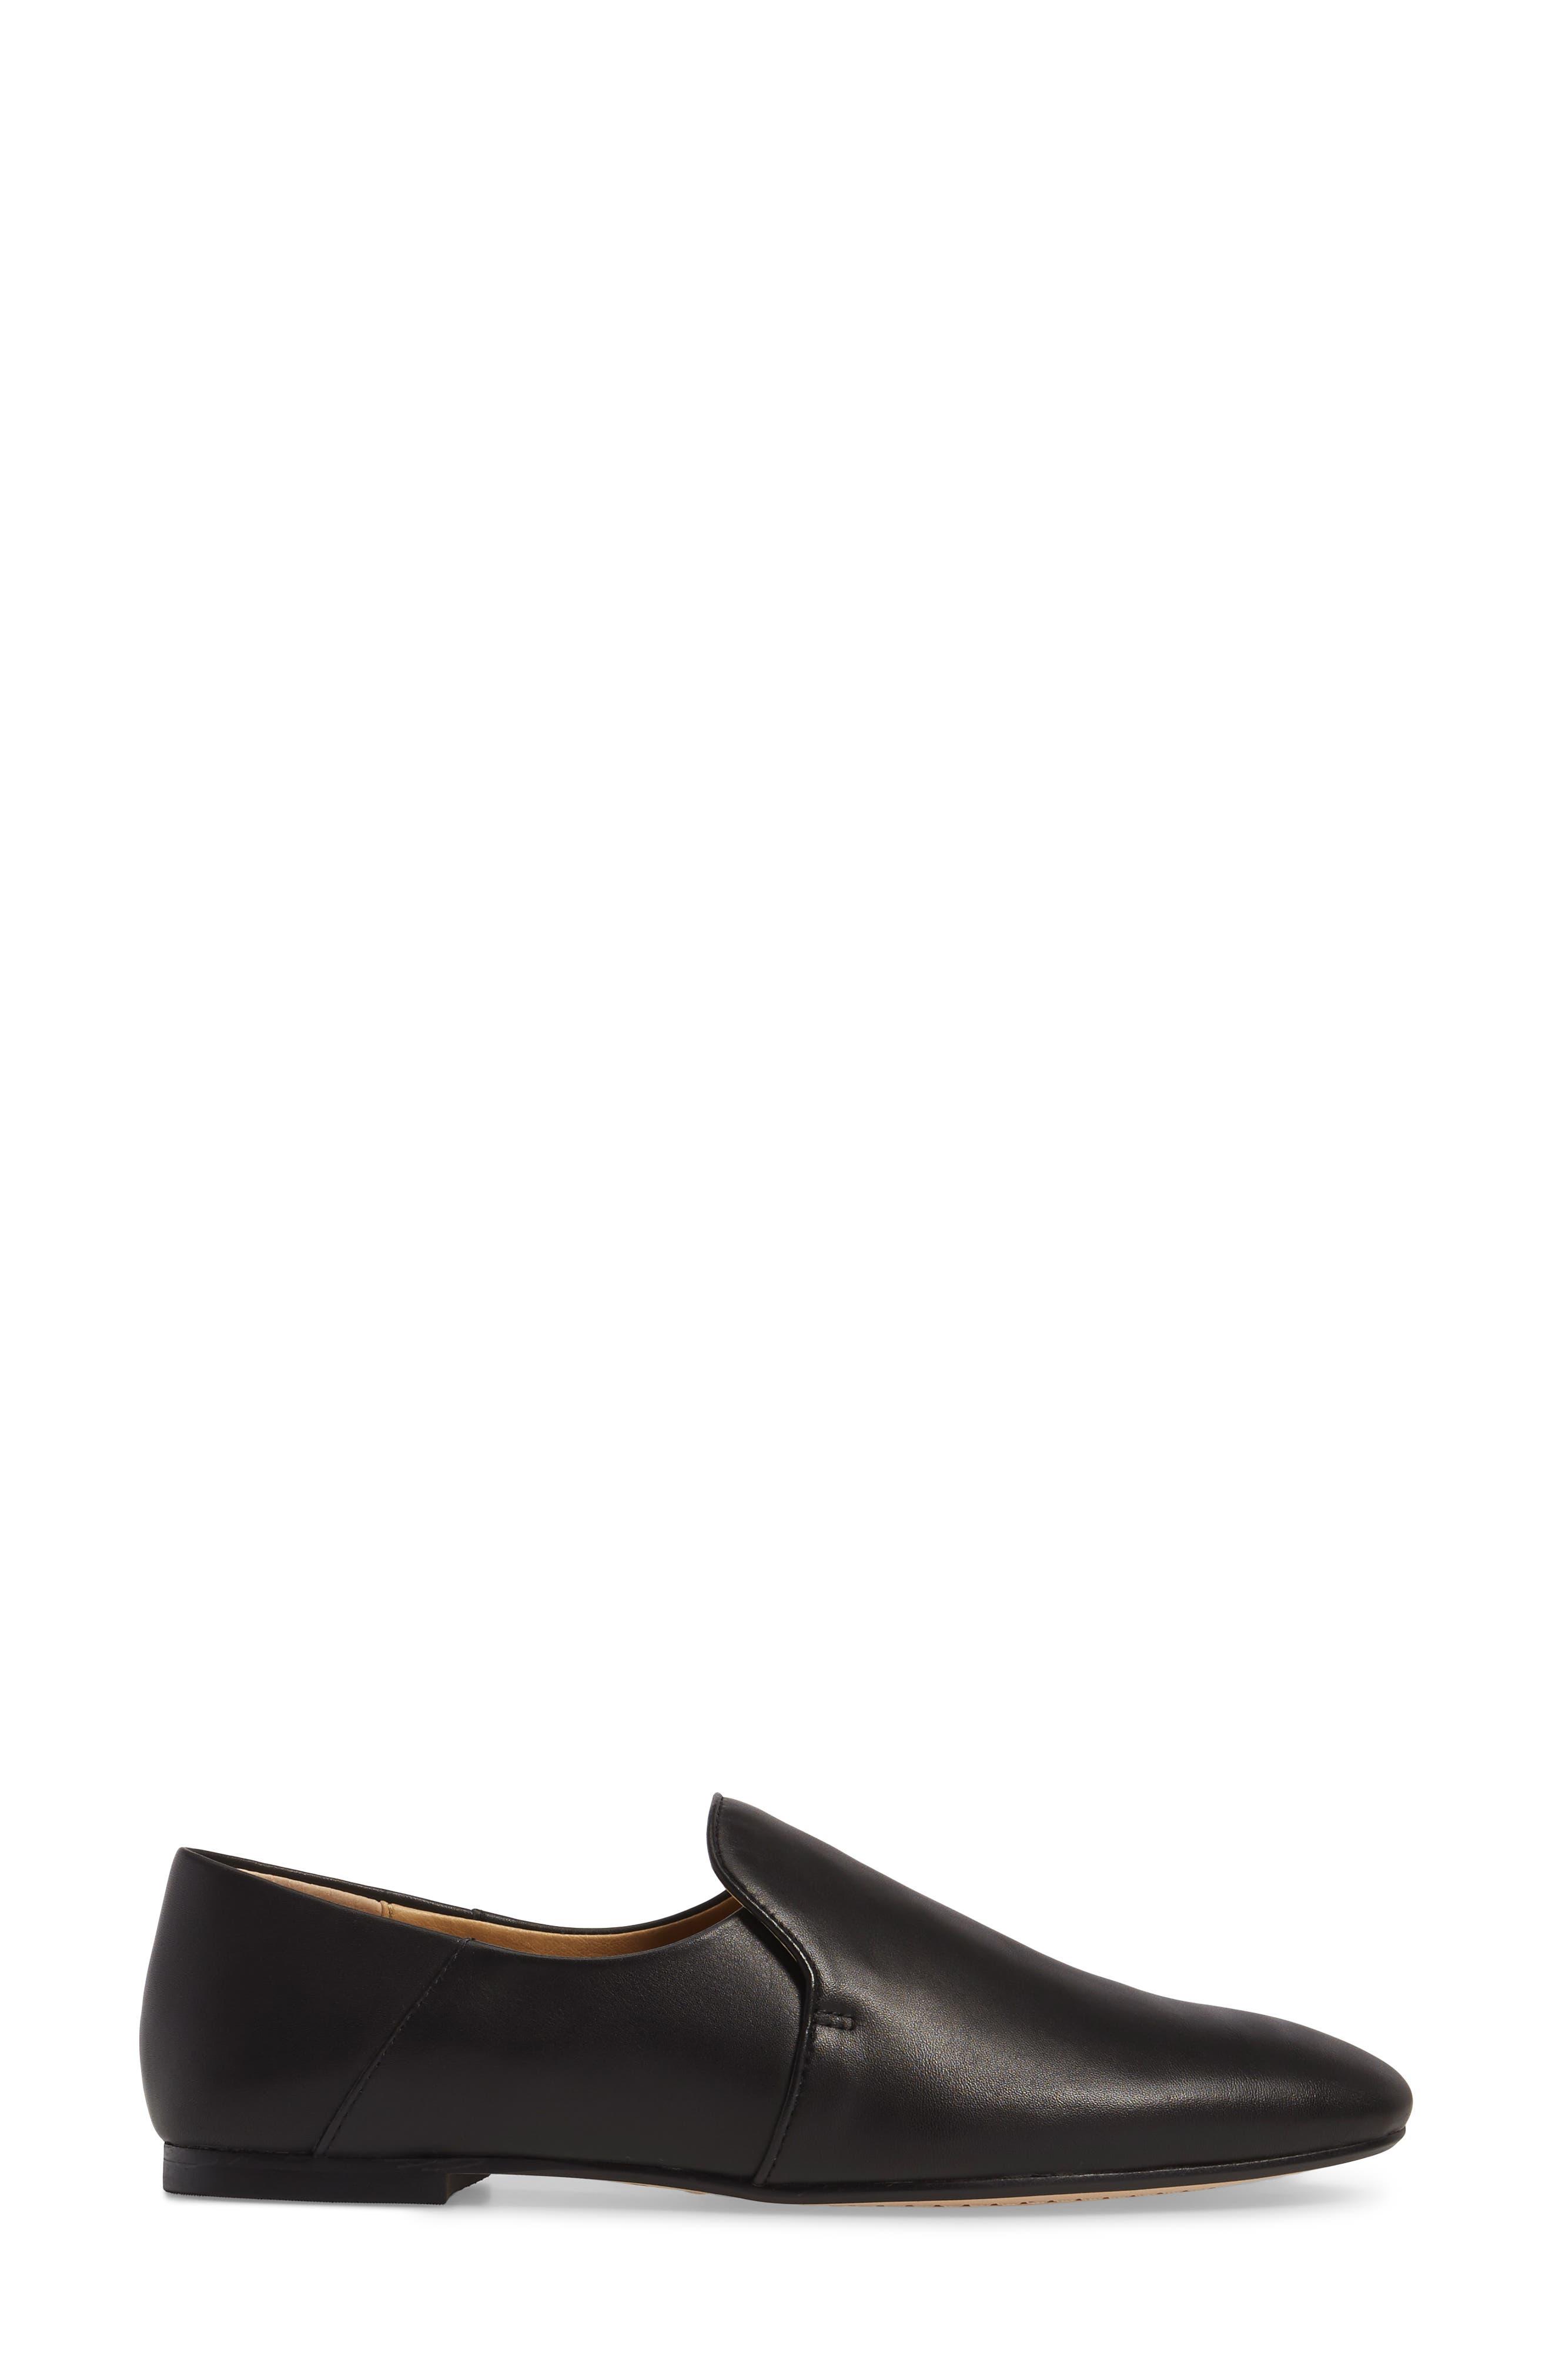 Alternate Image 3  - Splendid Derby Loafer Flat (Women)